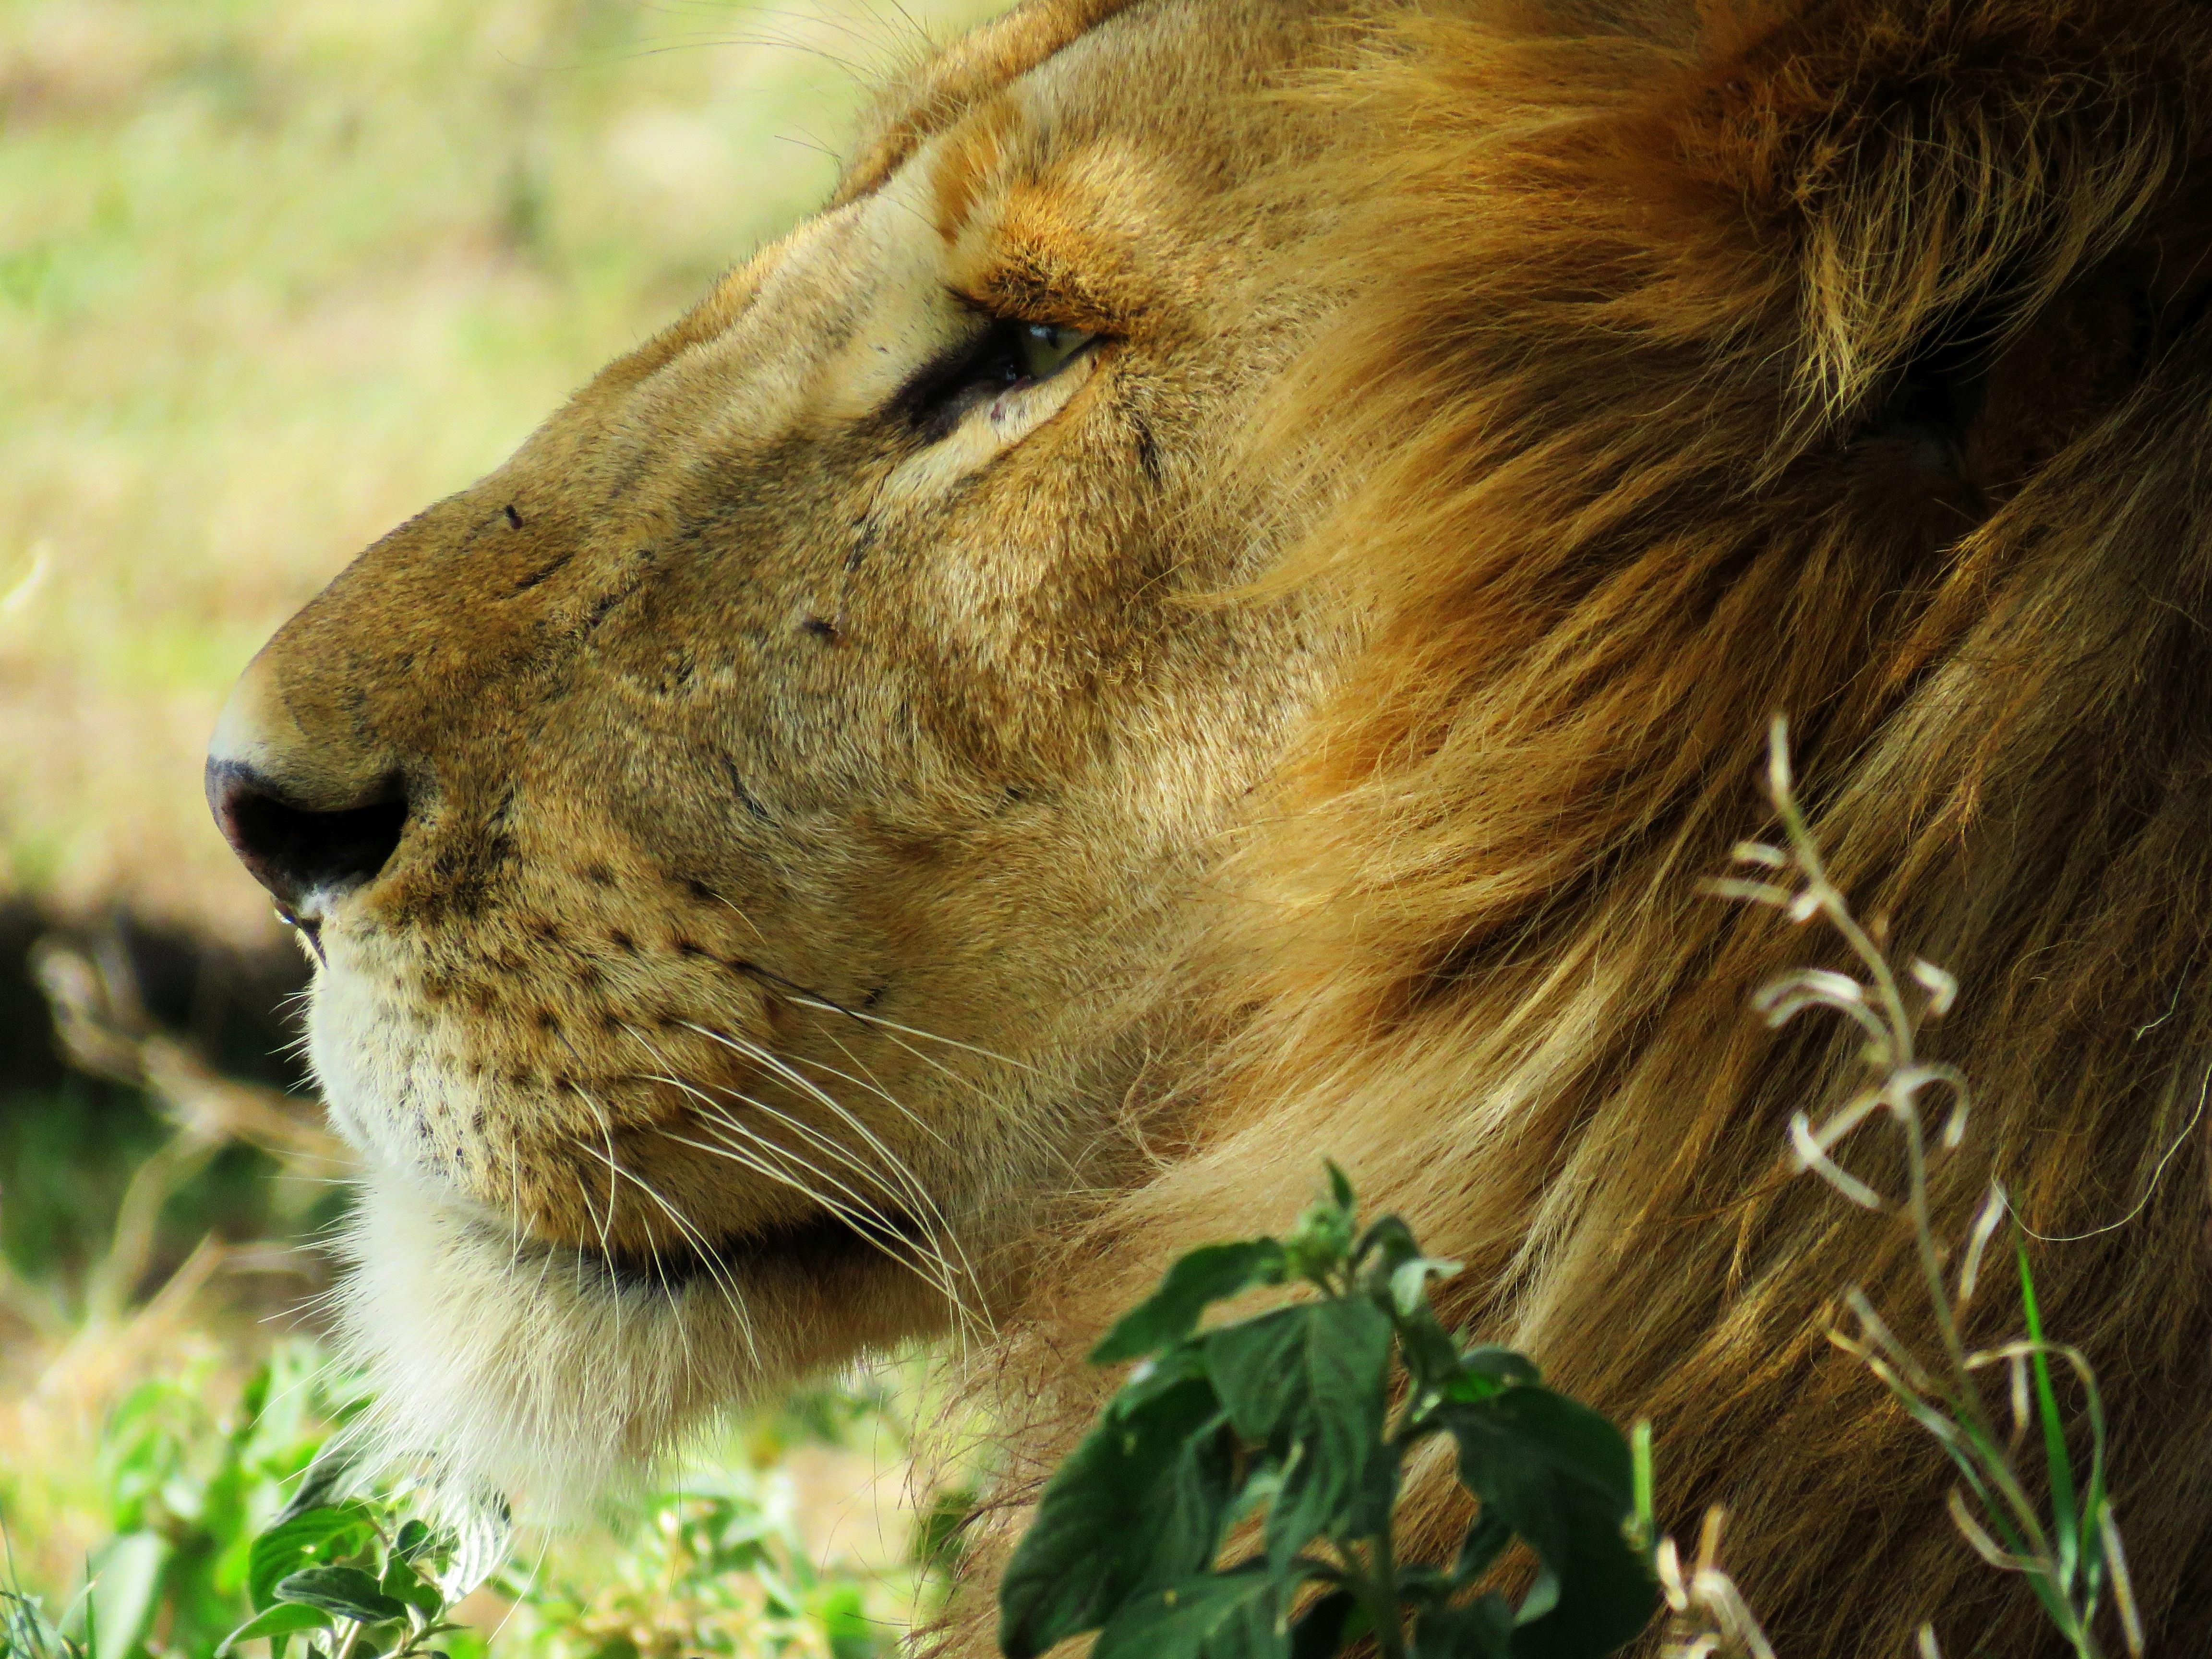 King, Animal, Fast, Fierce, Jungle, HQ Photo